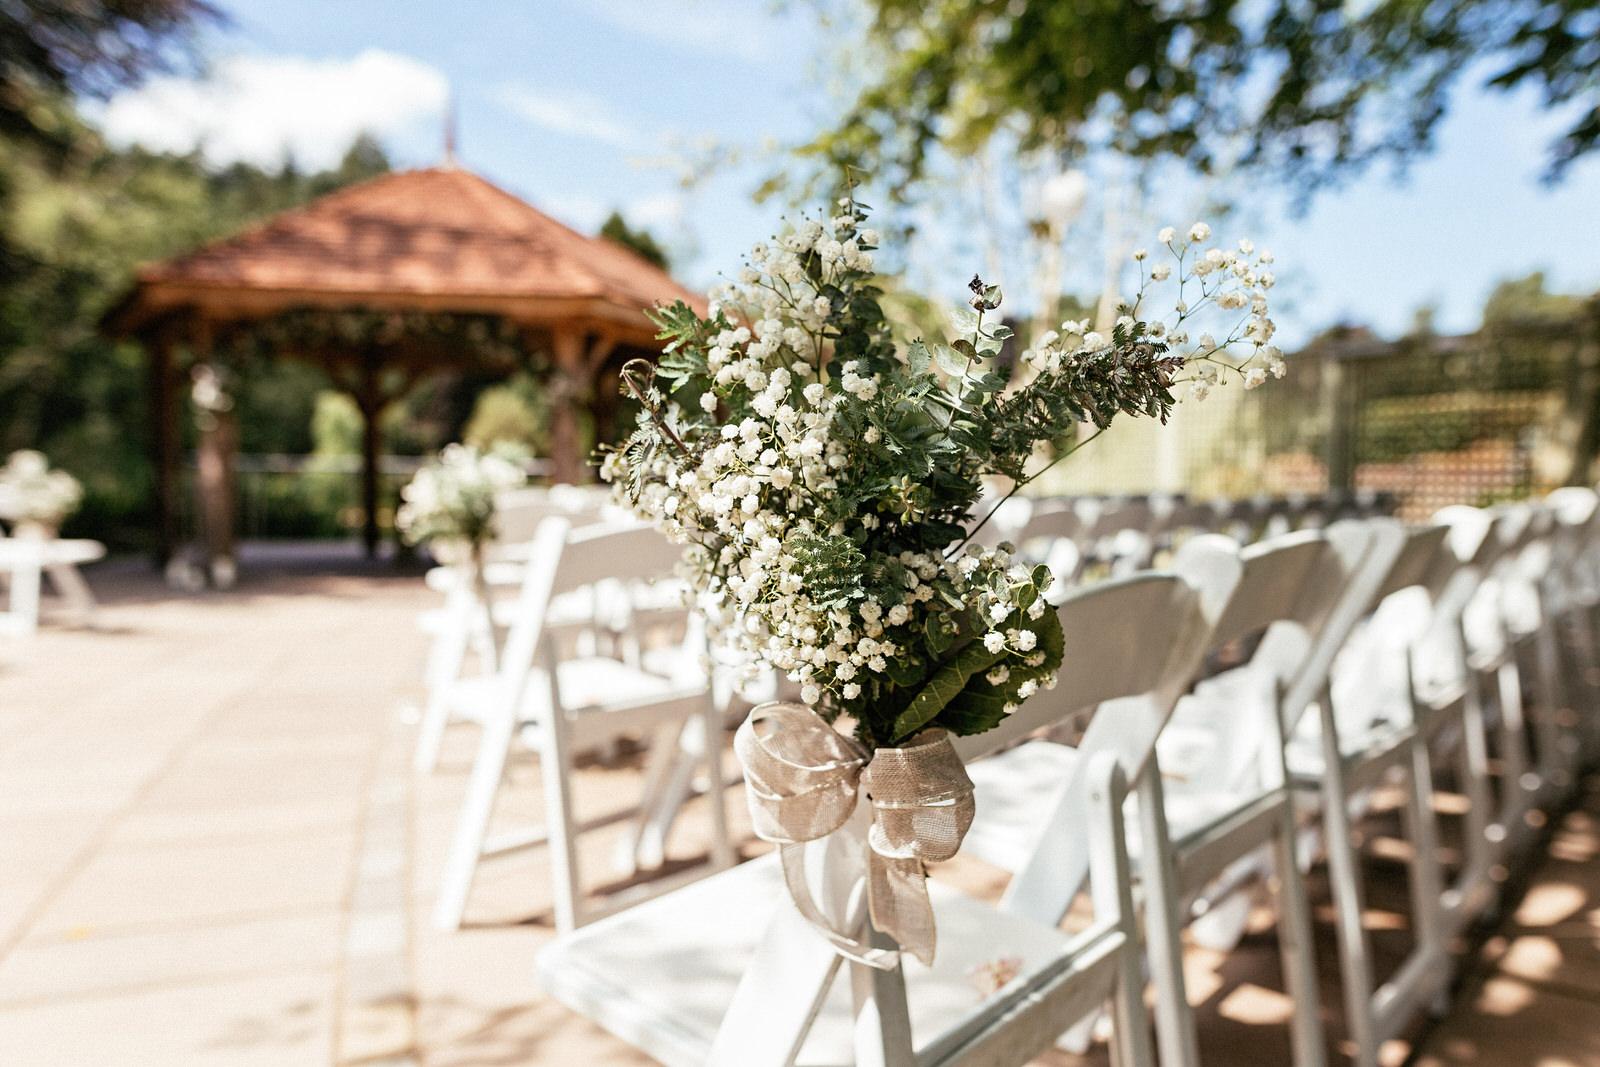 Moddershall-Oaks-Spa-Wedding-Photographer-009.jpg